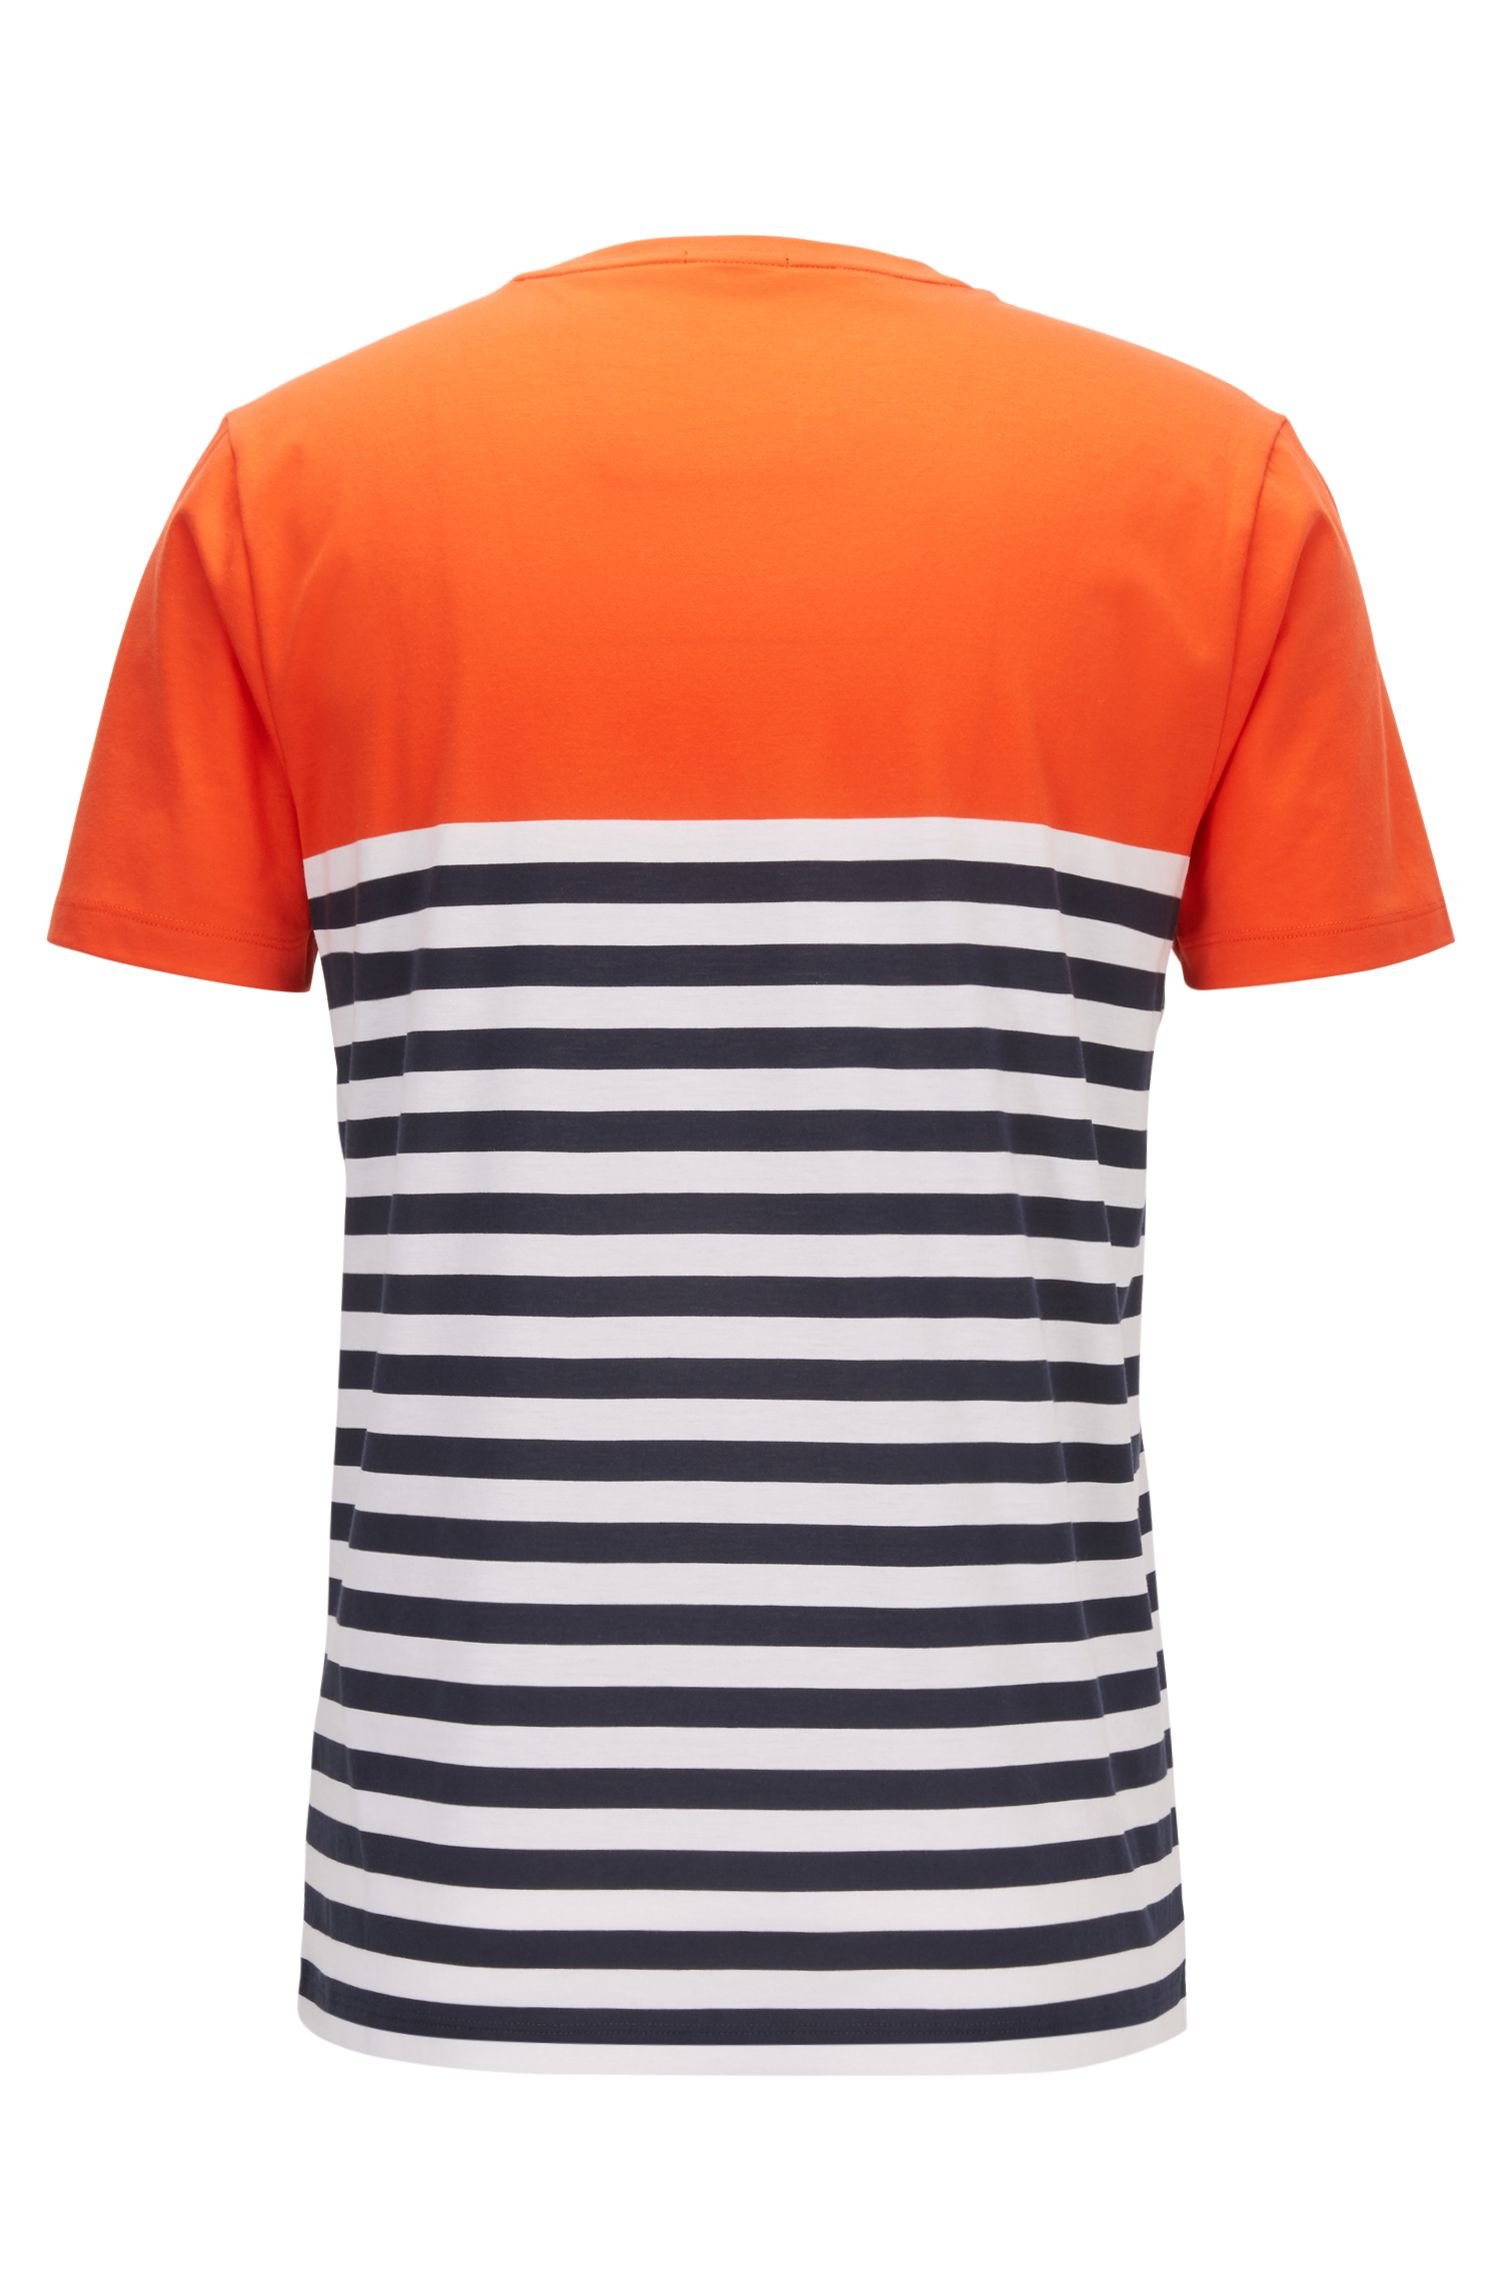 Stripe Colorblock T-Shirt | Tessler, Orange